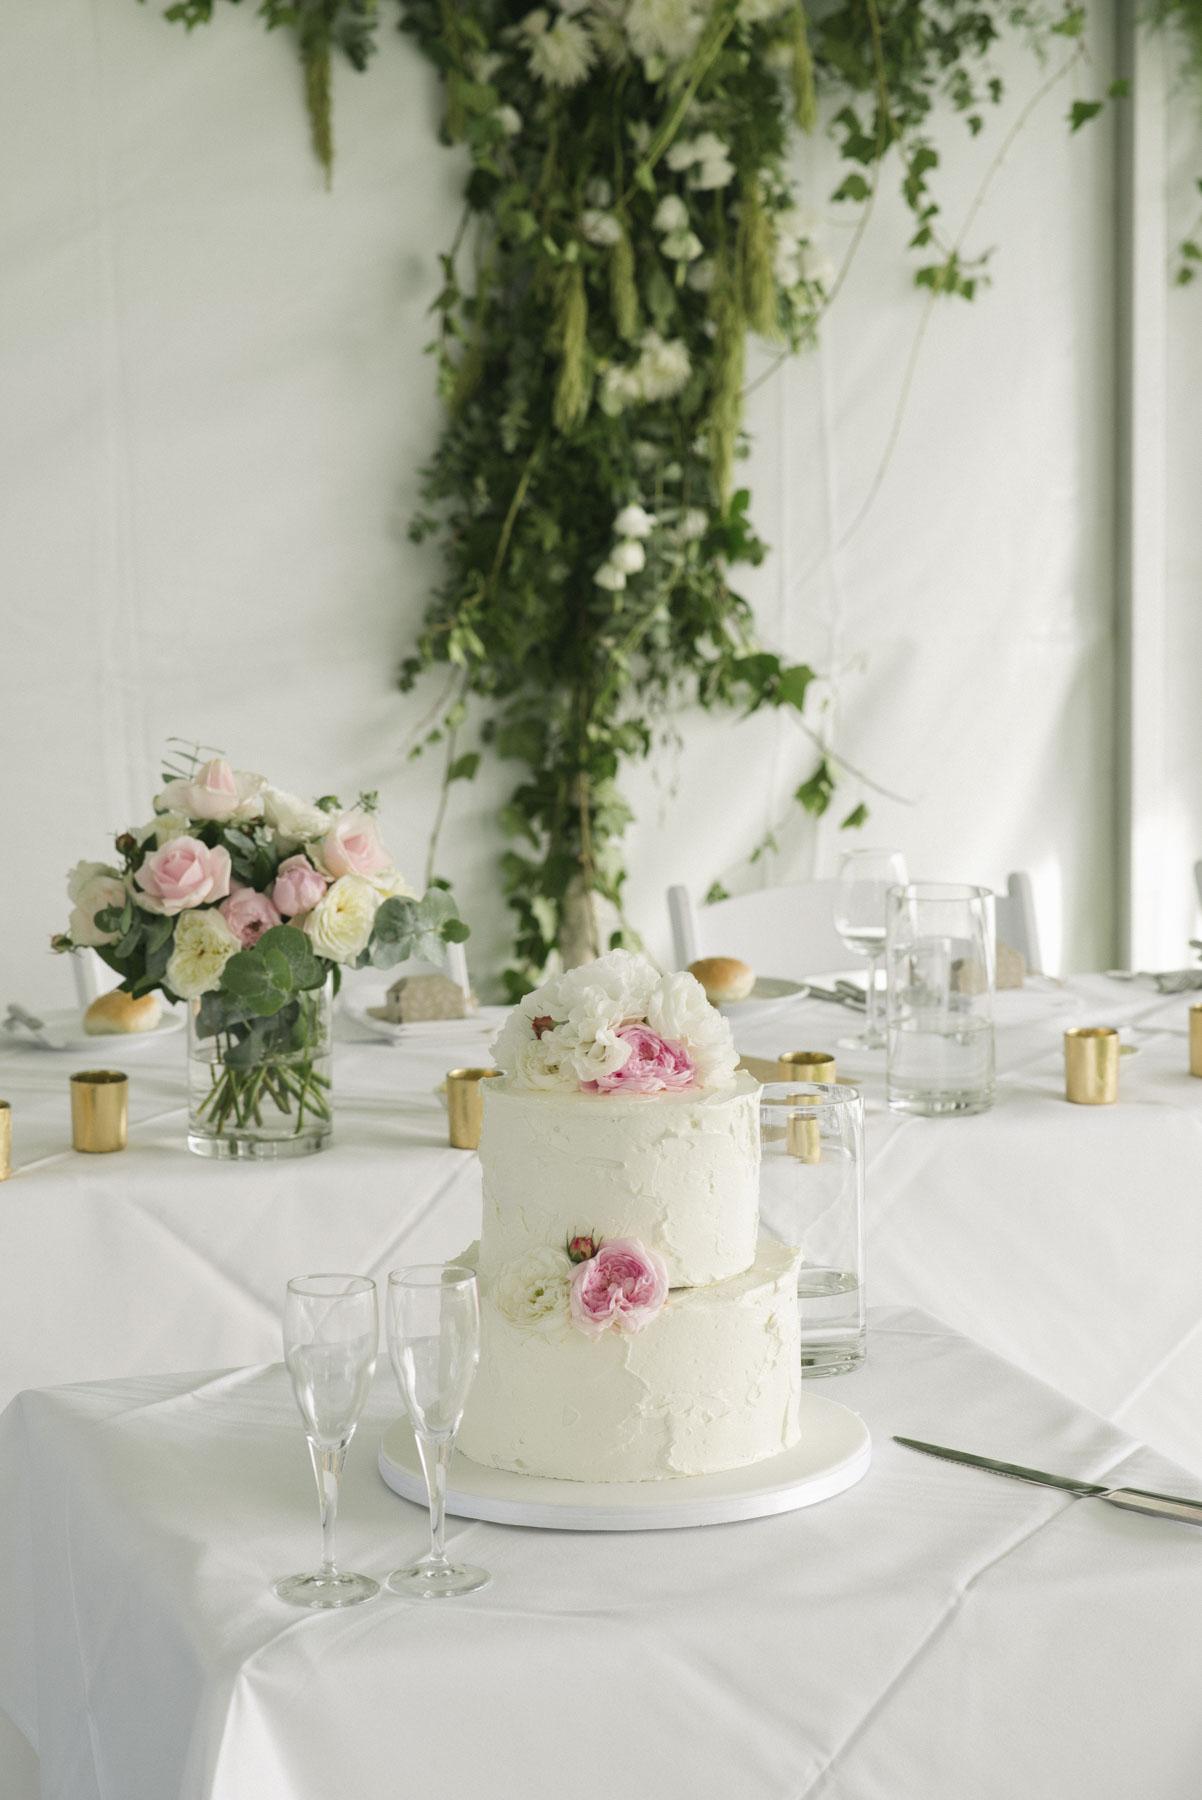 1501vand-274alan_moyle_wedding_portrait_brighton_bayside_werribee_estate_mansion_zoo_rustic_styled_garden_mansion_candid_documentry_victoria_whitelaw.jpg